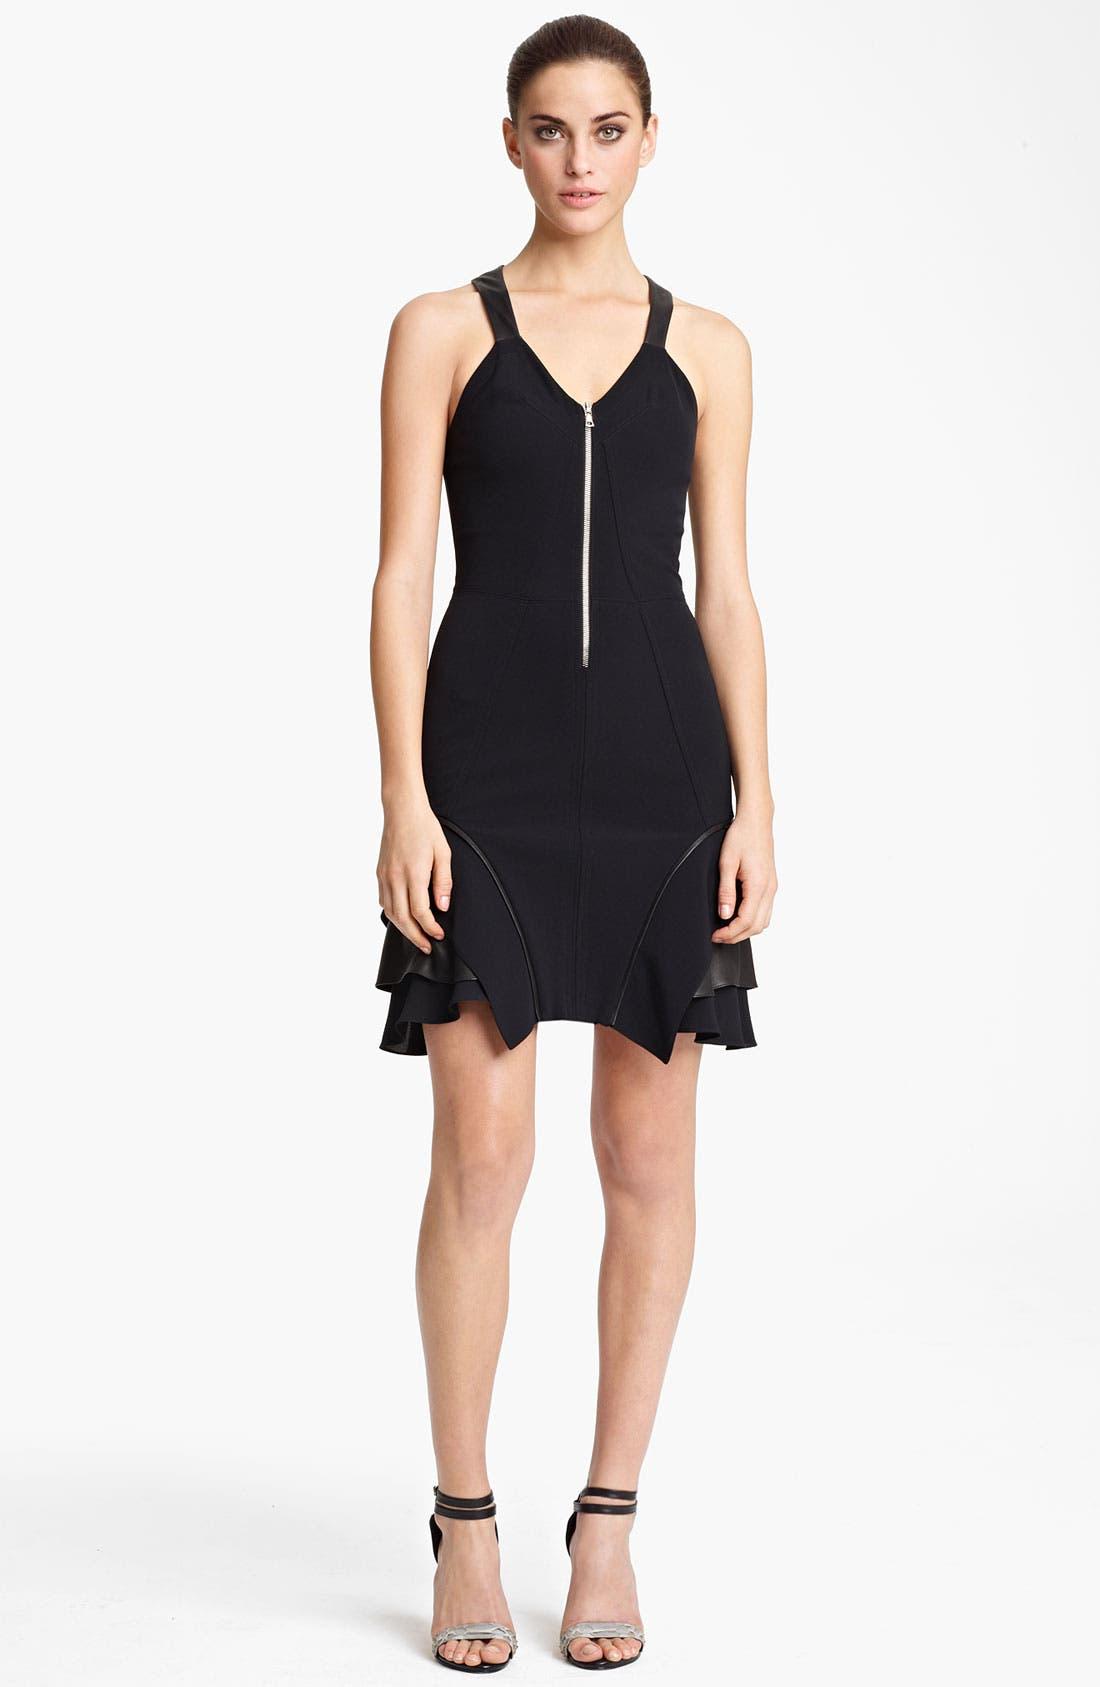 Alternate Image 1 Selected - Yigal Azrouël Crepe & Jersey Dress